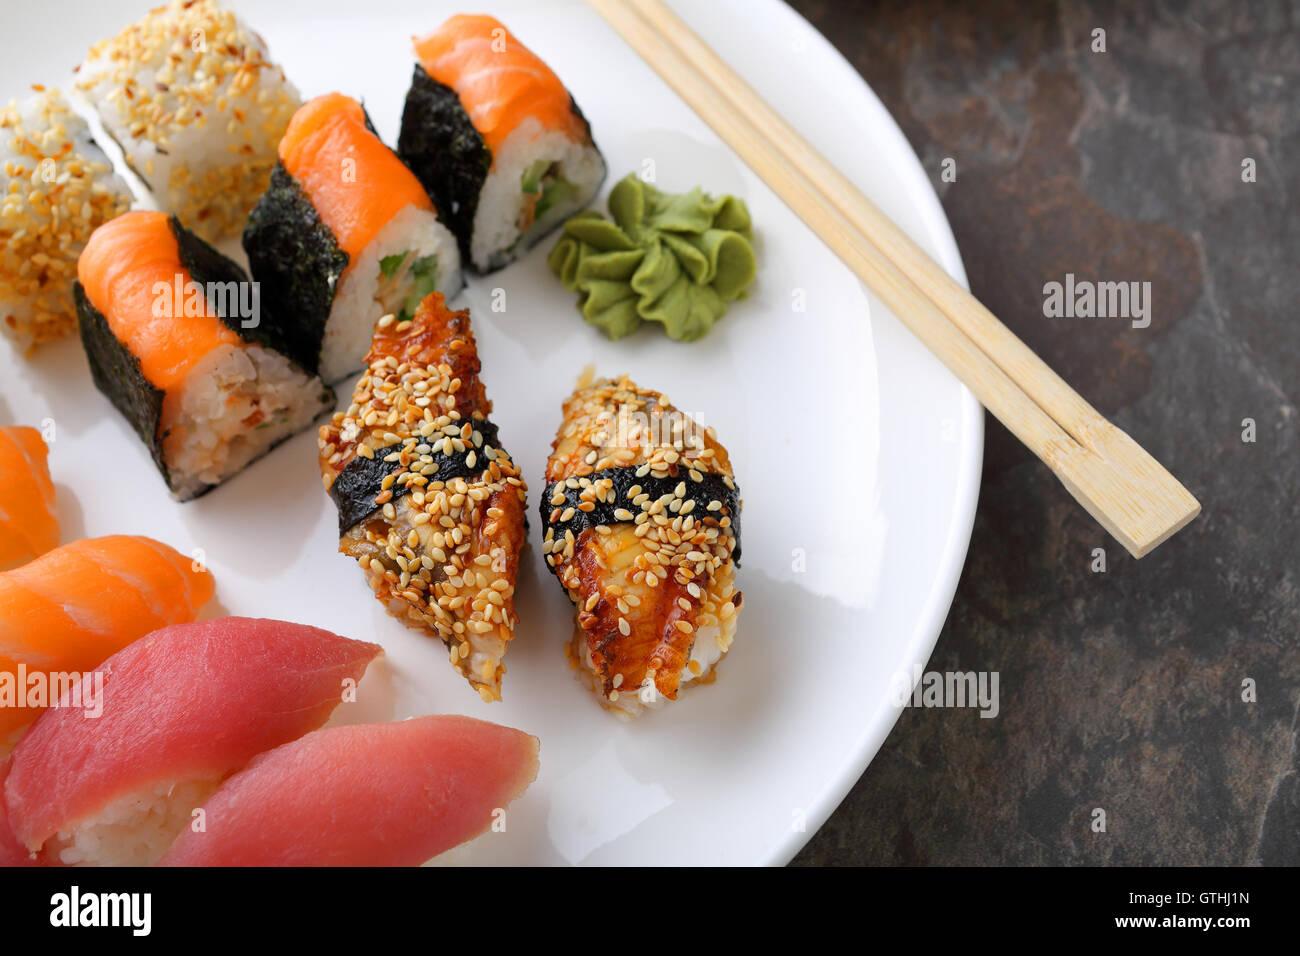 Sushi set su piastra bianca, Giappone fast food Immagini Stock